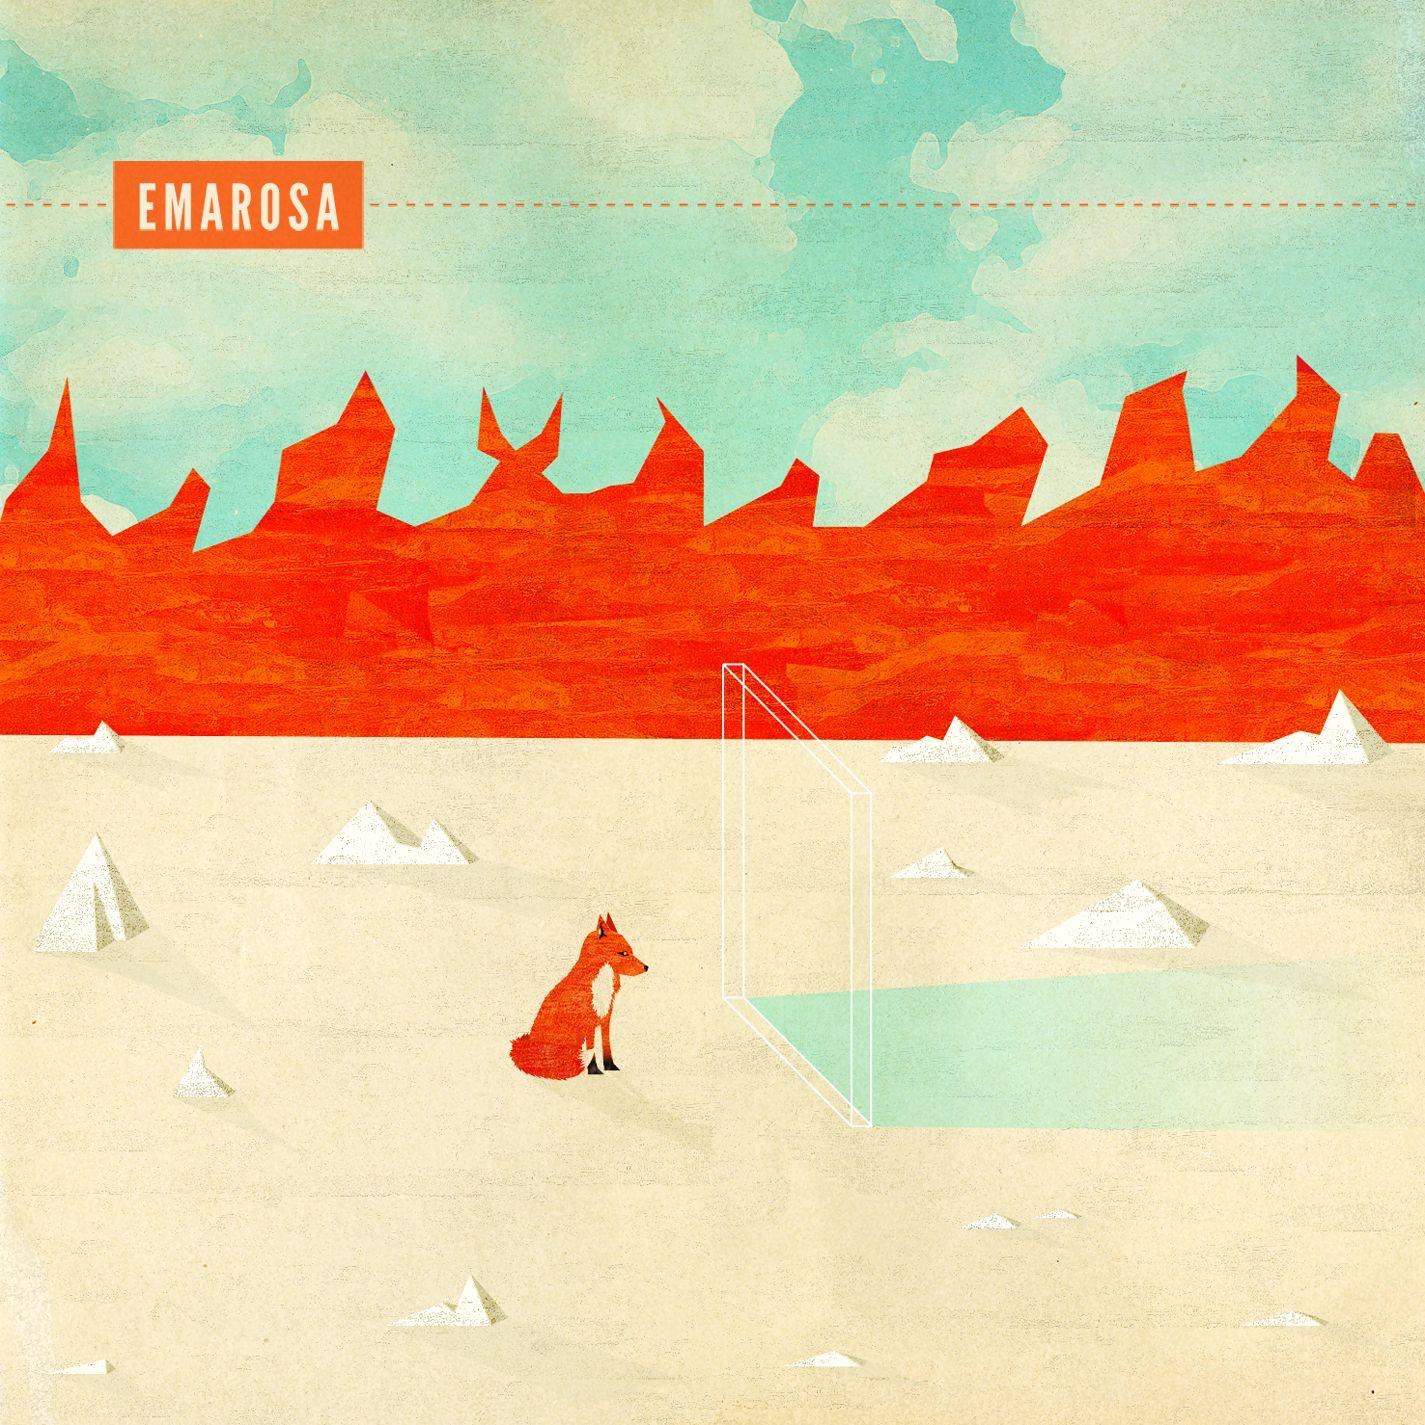 Emarosa - Emarosa (2010)